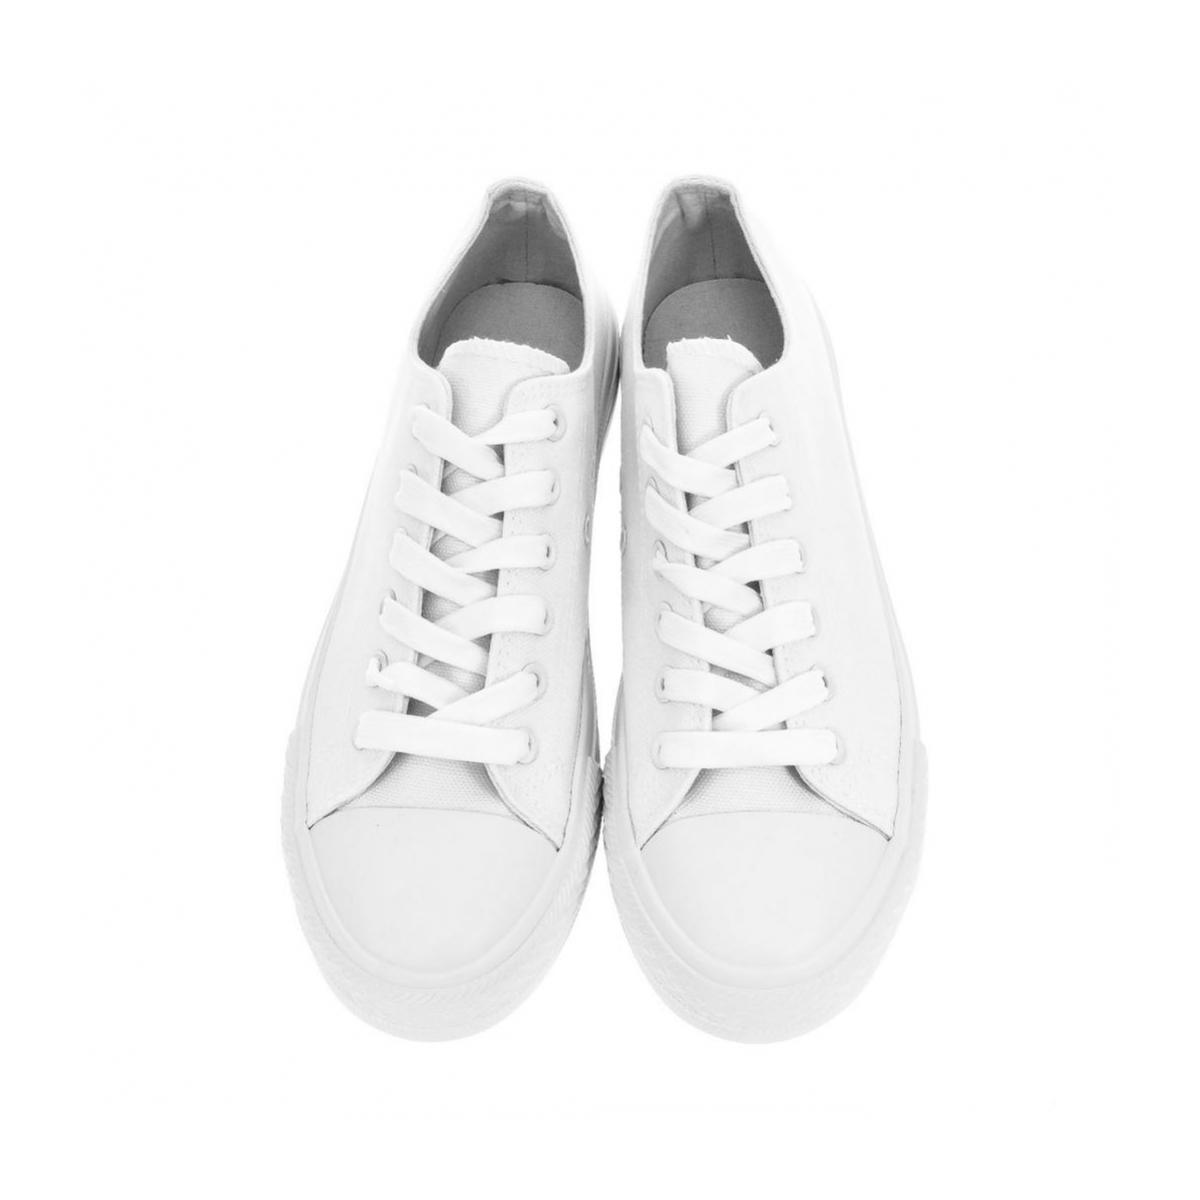 70afae5b98ba Dámske biele tenisky REINA - 4